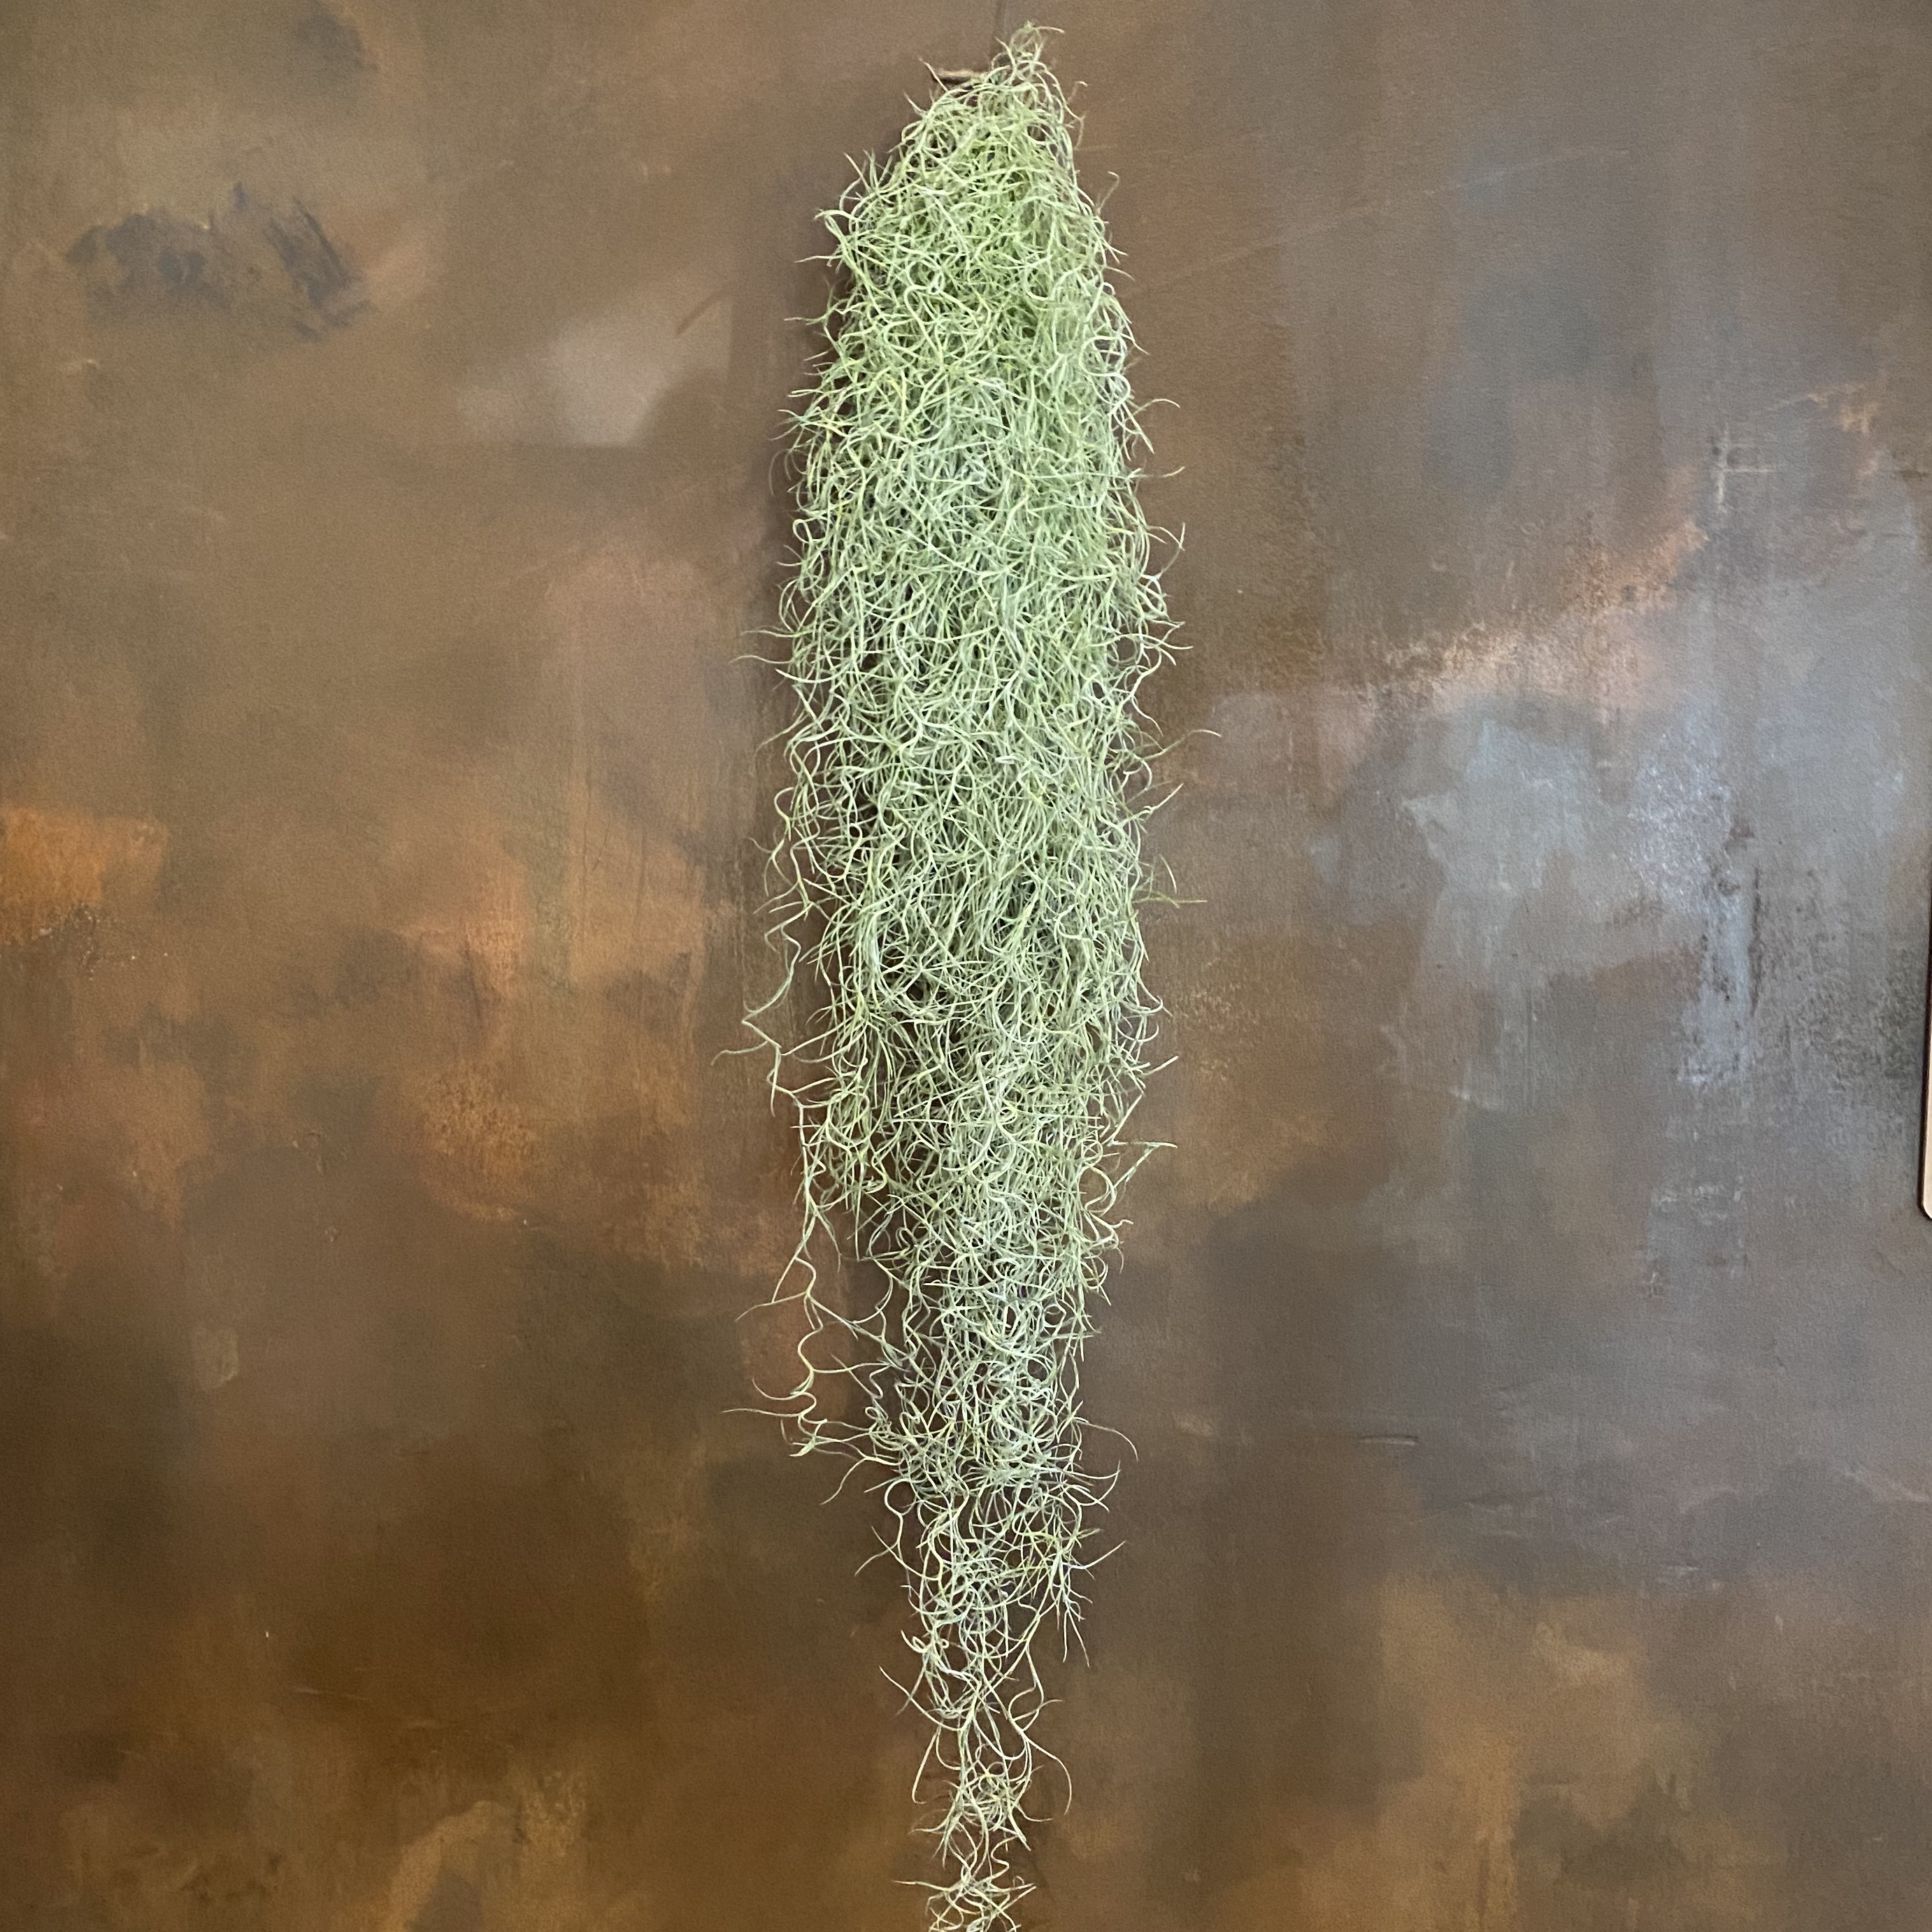 Tillandsia usnoides XL (Spanish Moss)